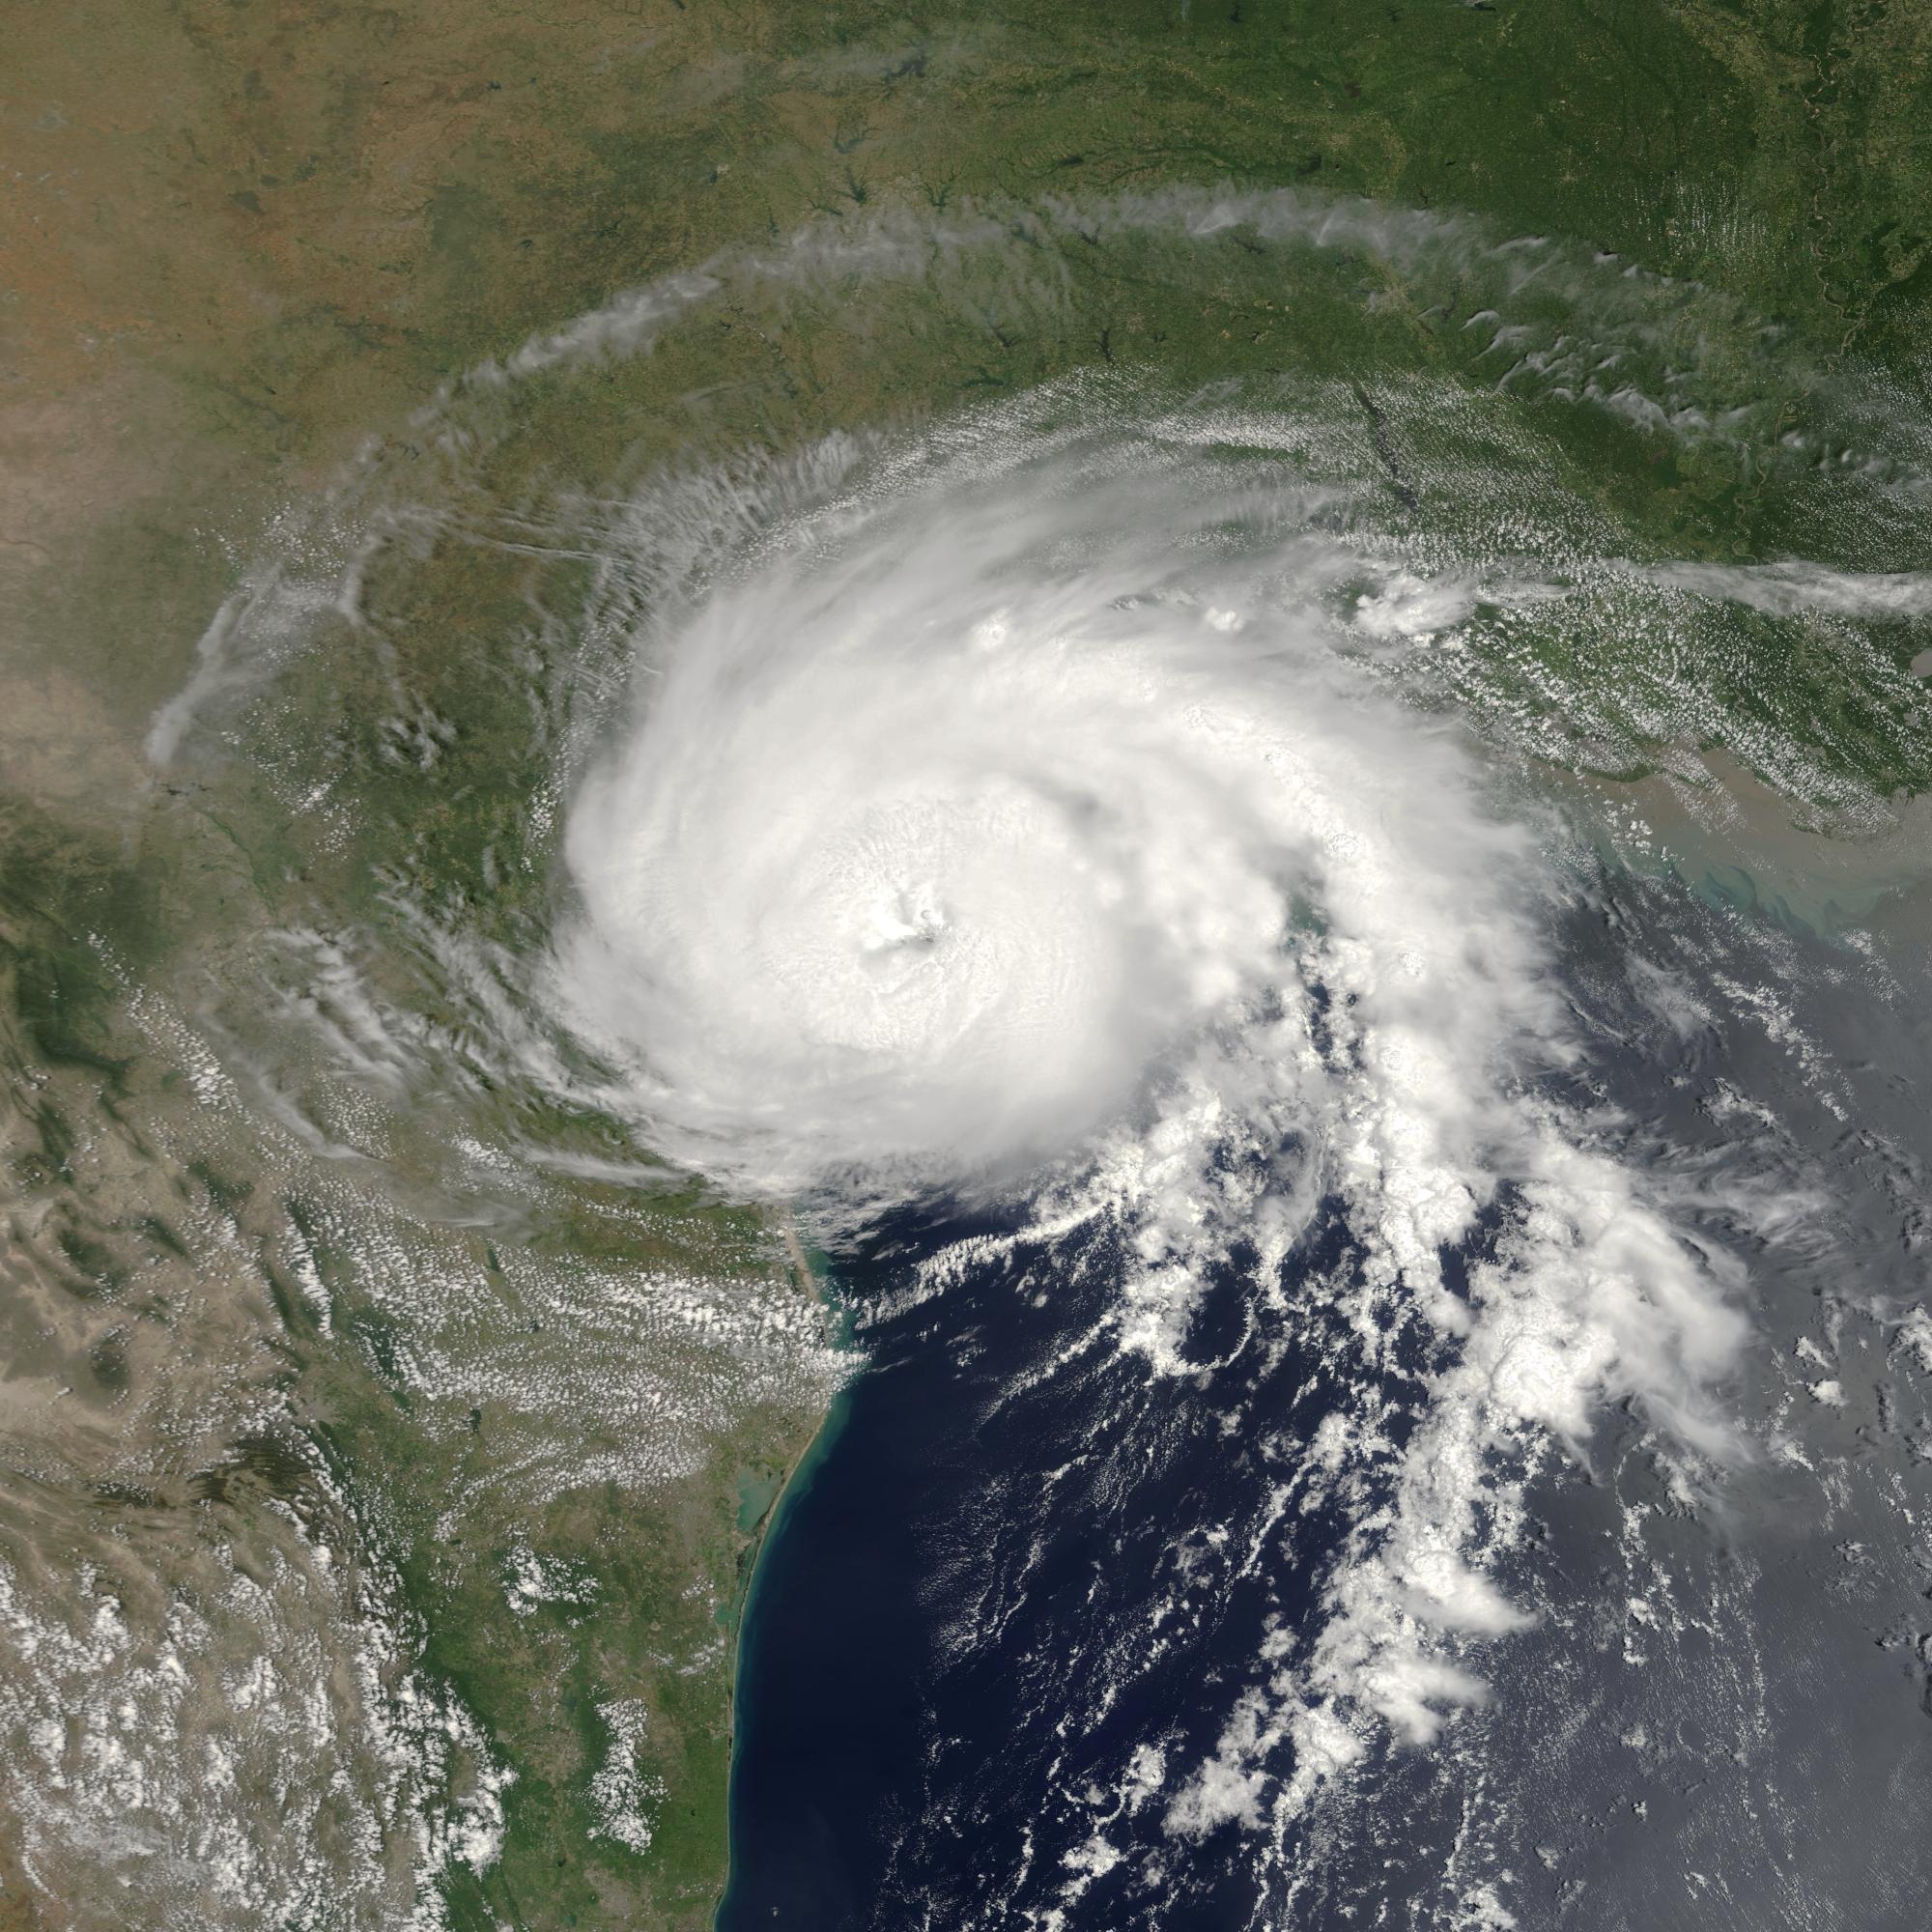 File:Hurricane claudette july 15 2003.jpg